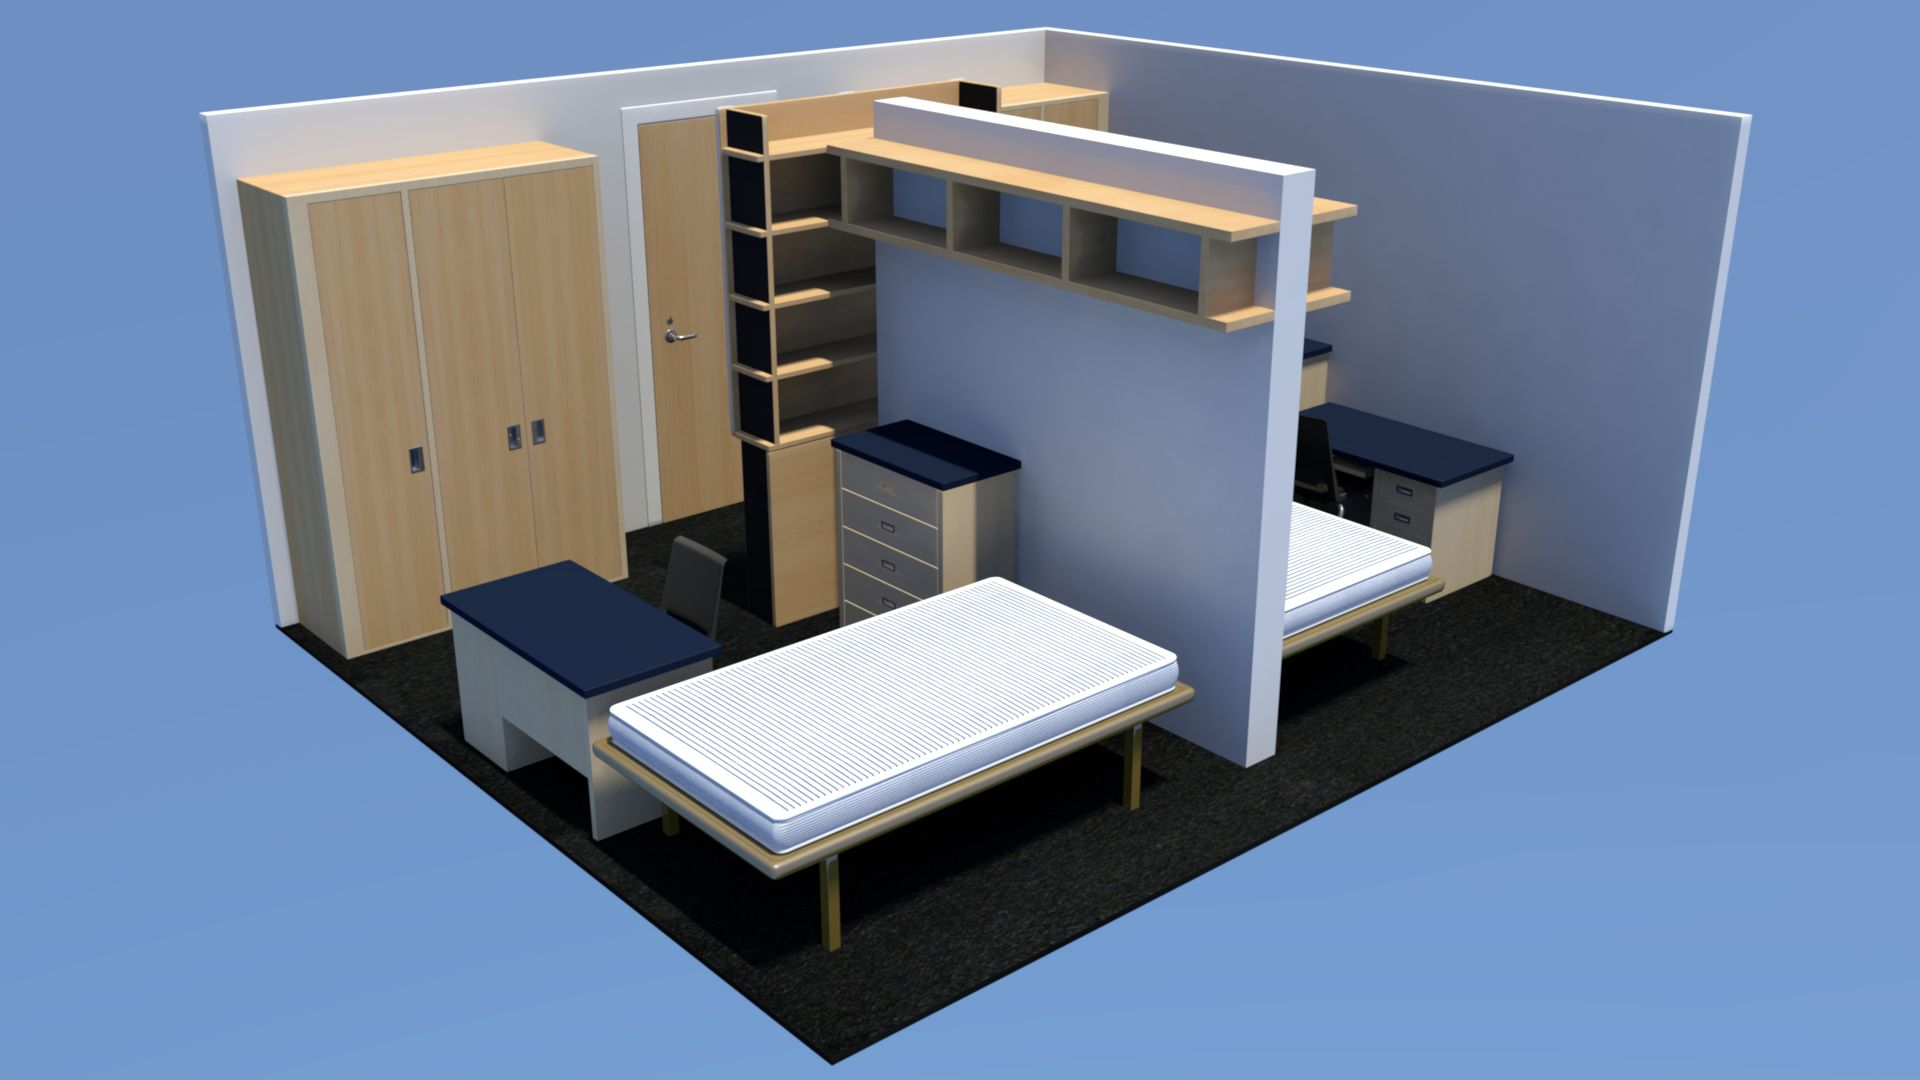 Syracuse University Dorm Floor Plan Dorm Room University Dorms Dorm